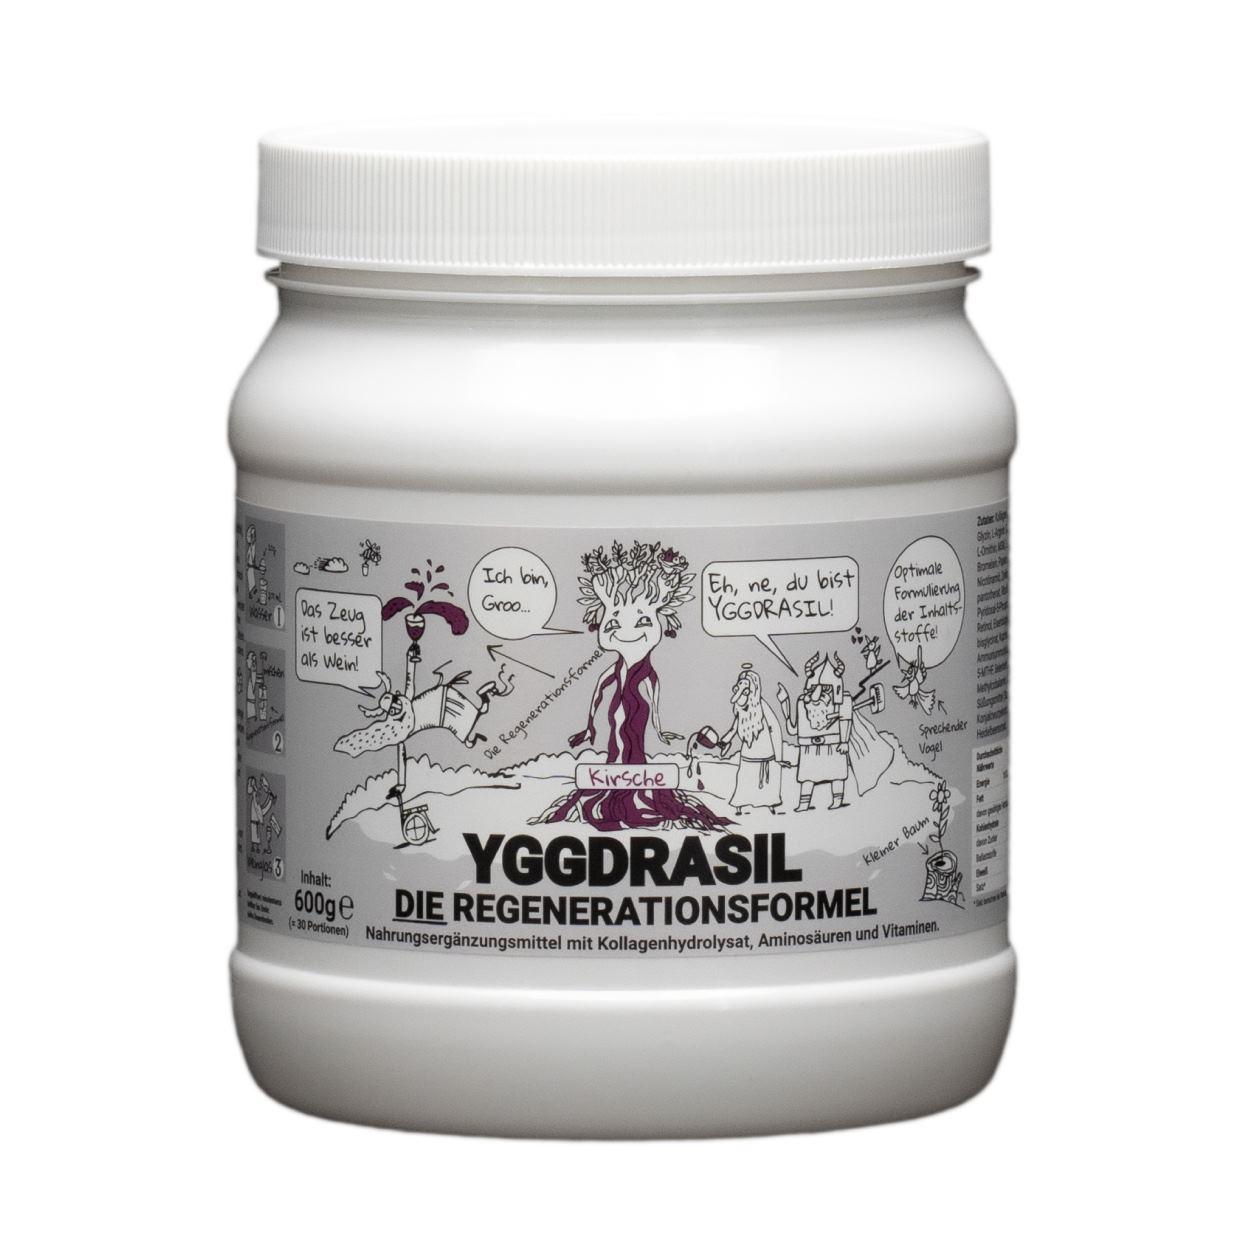 Yggdrasil DIE Regenerationsformel Produktbild Chris Eikelmeier Götterspeise Nahrungsergänzungsmittel_Kirsche